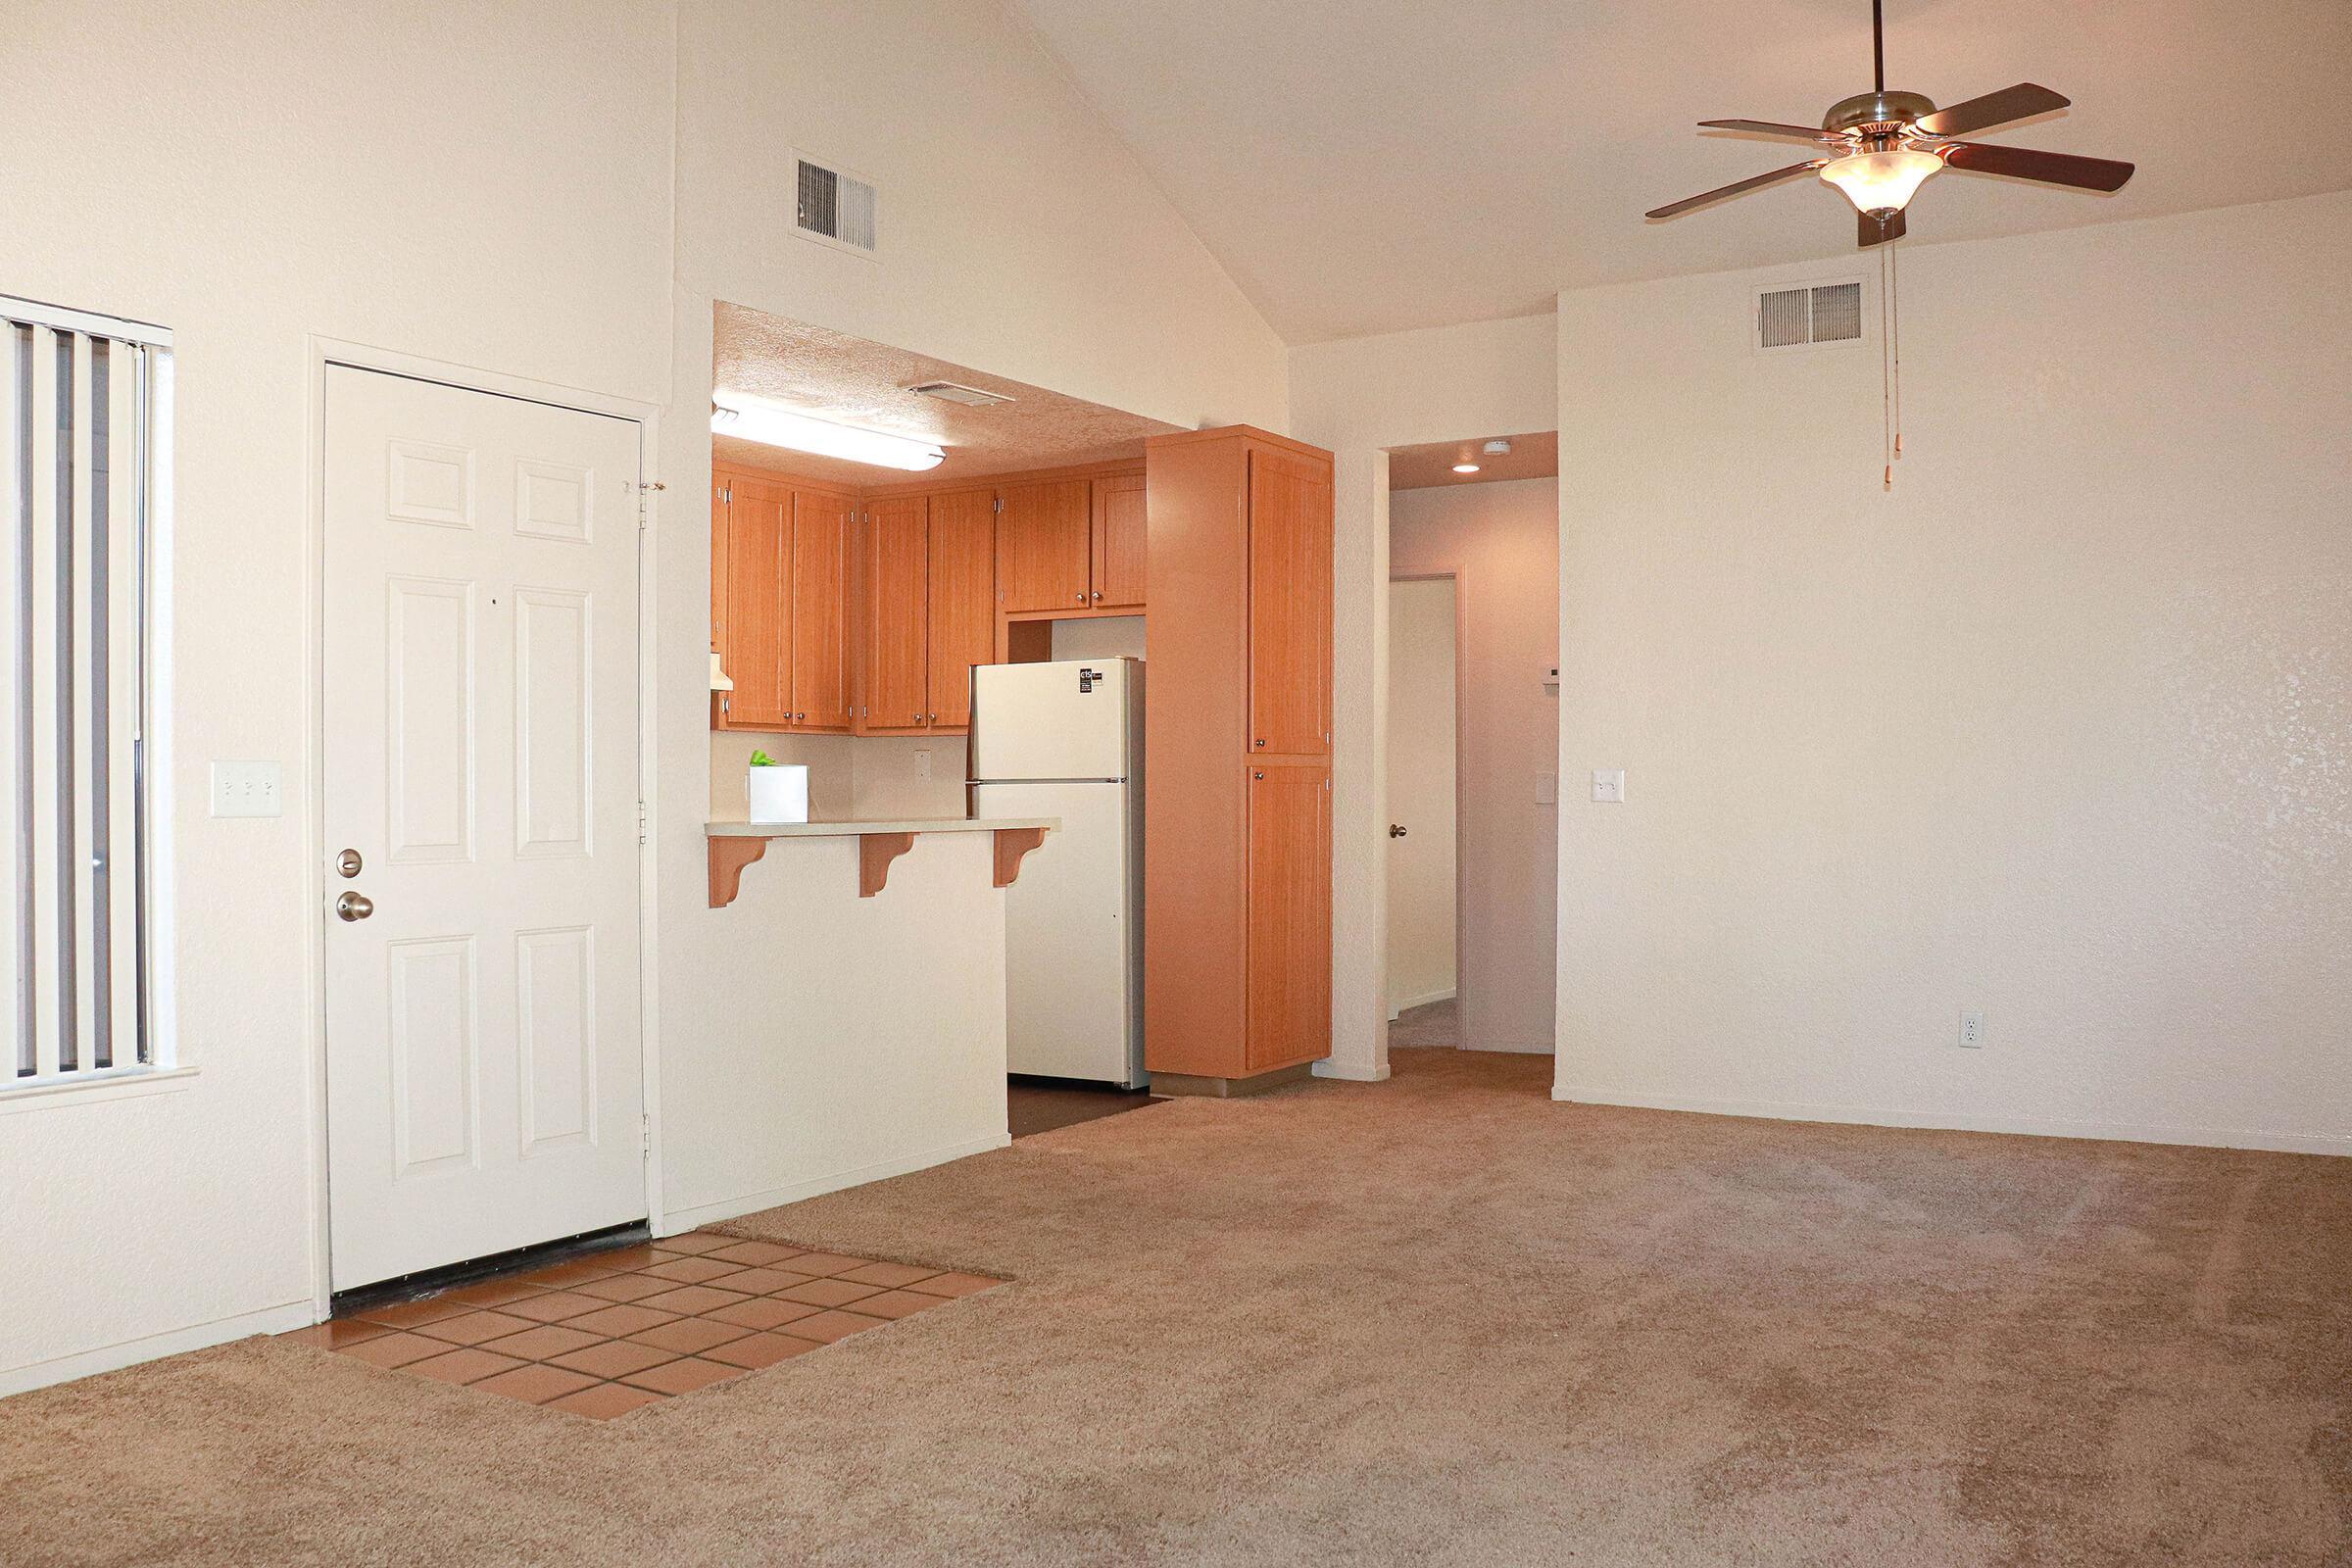 a white refrigerator freezer sitting inside of a house